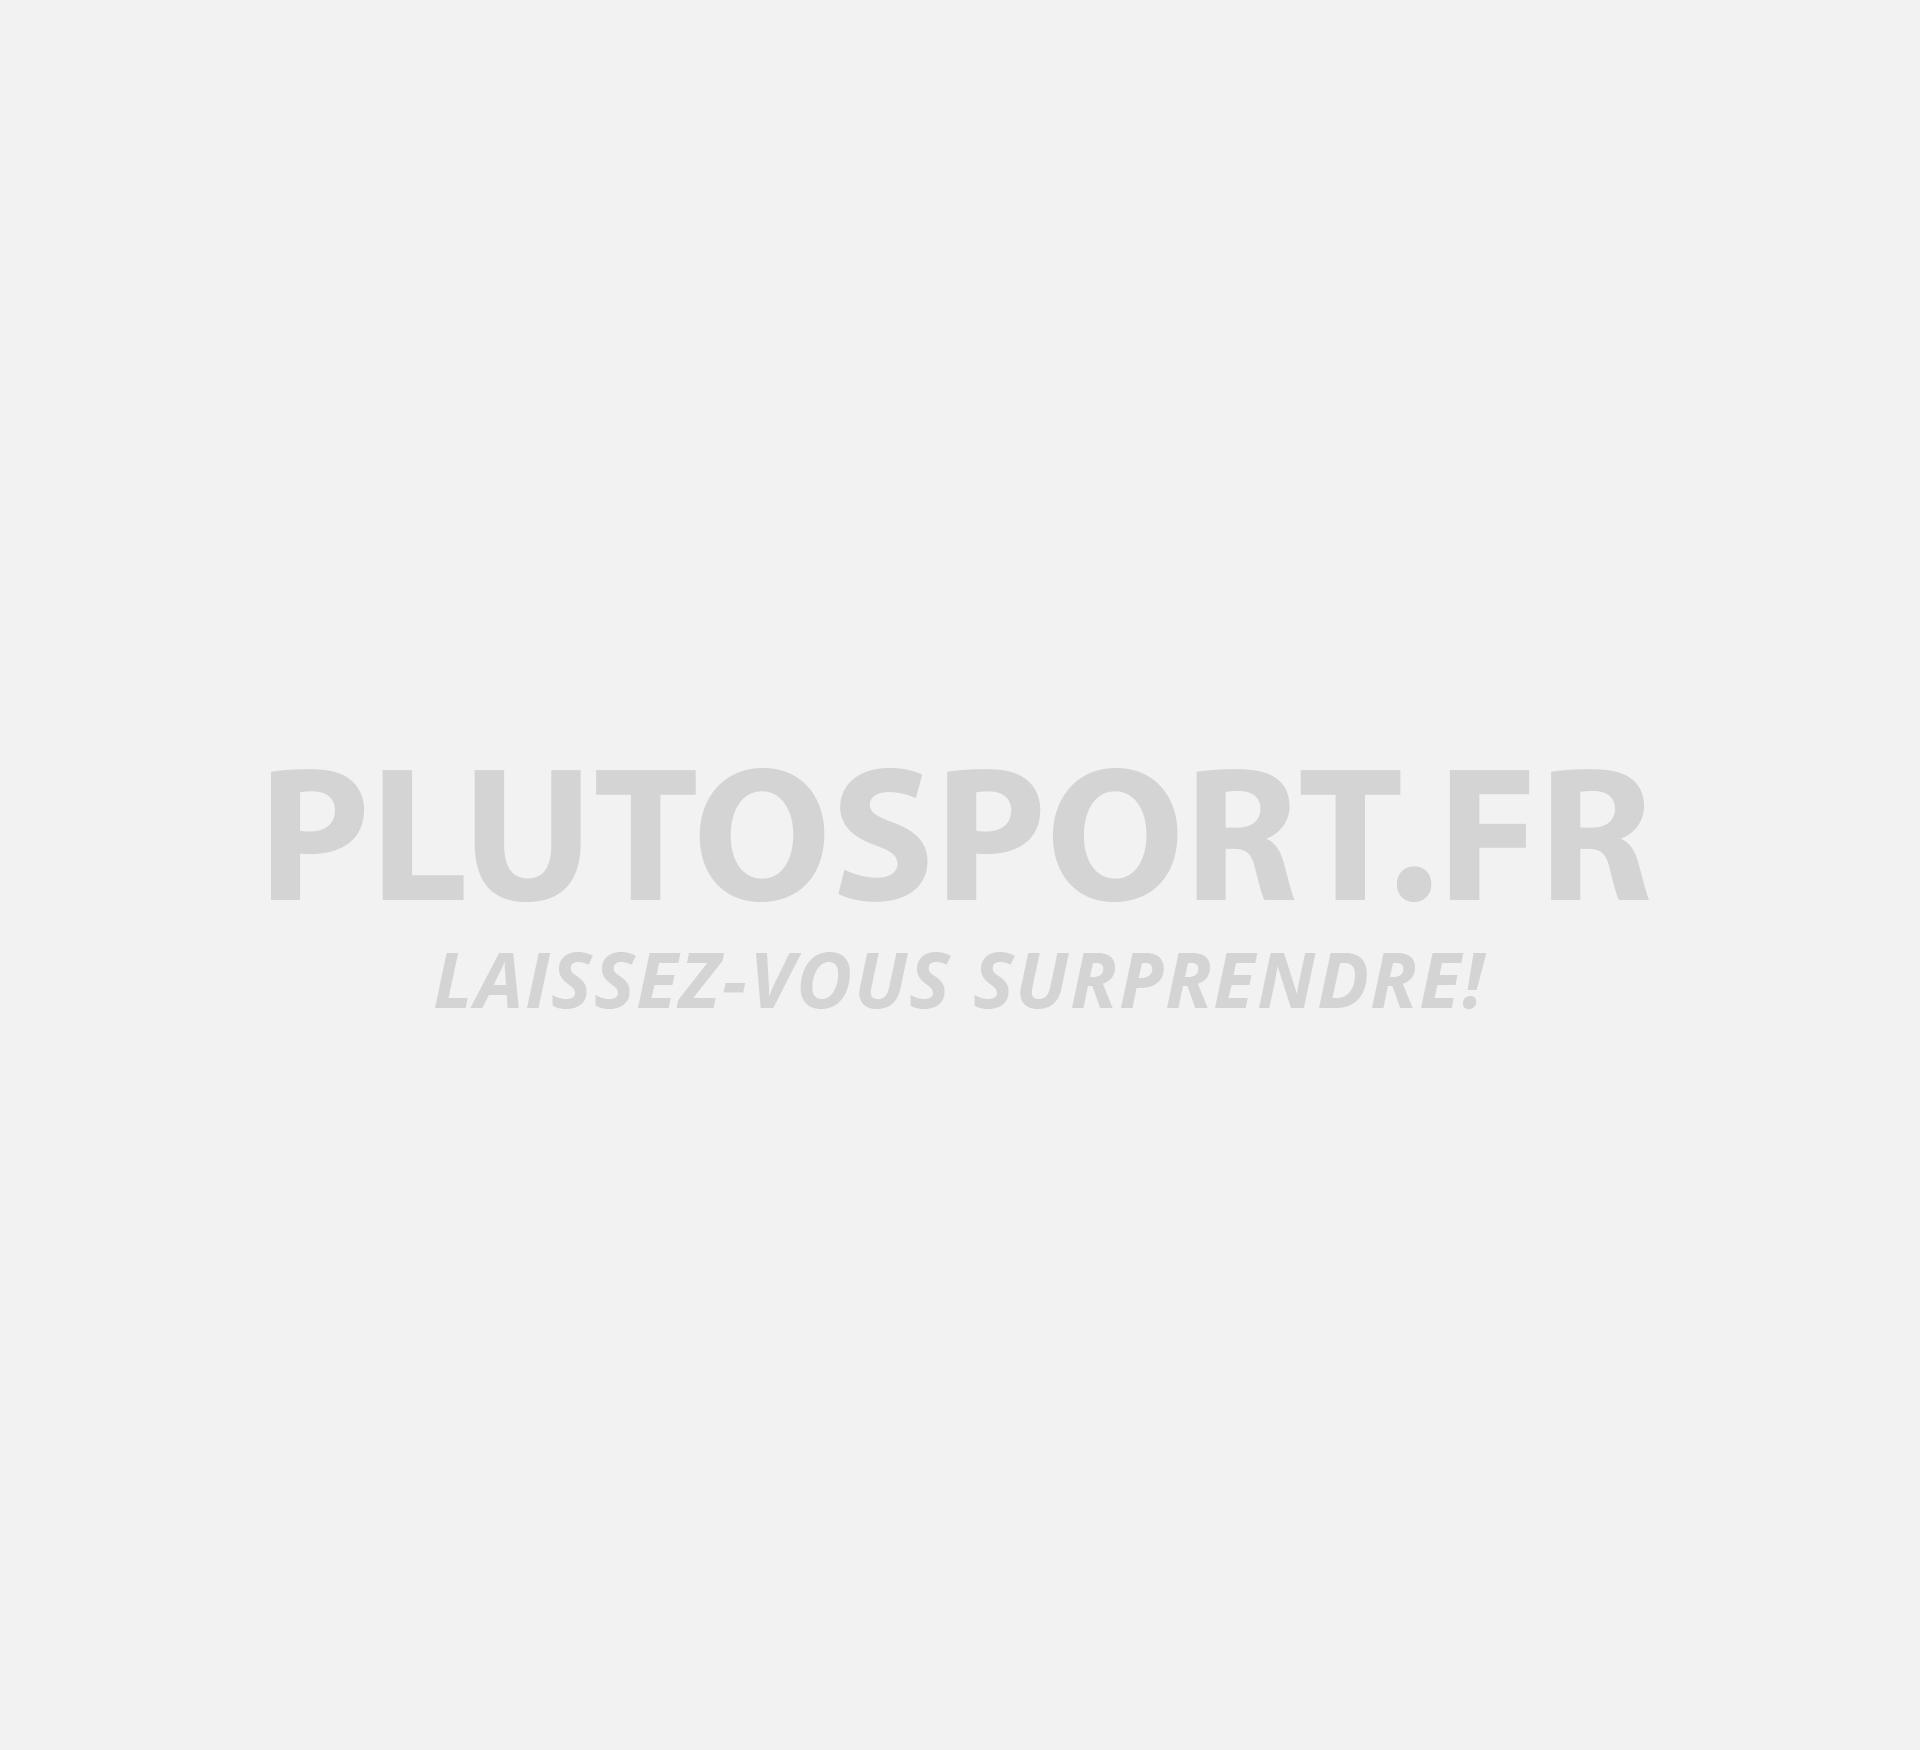 SportsPlutosport Vêtements Jupe T16 Tennis Adidas Jupes u3l1JcTFK